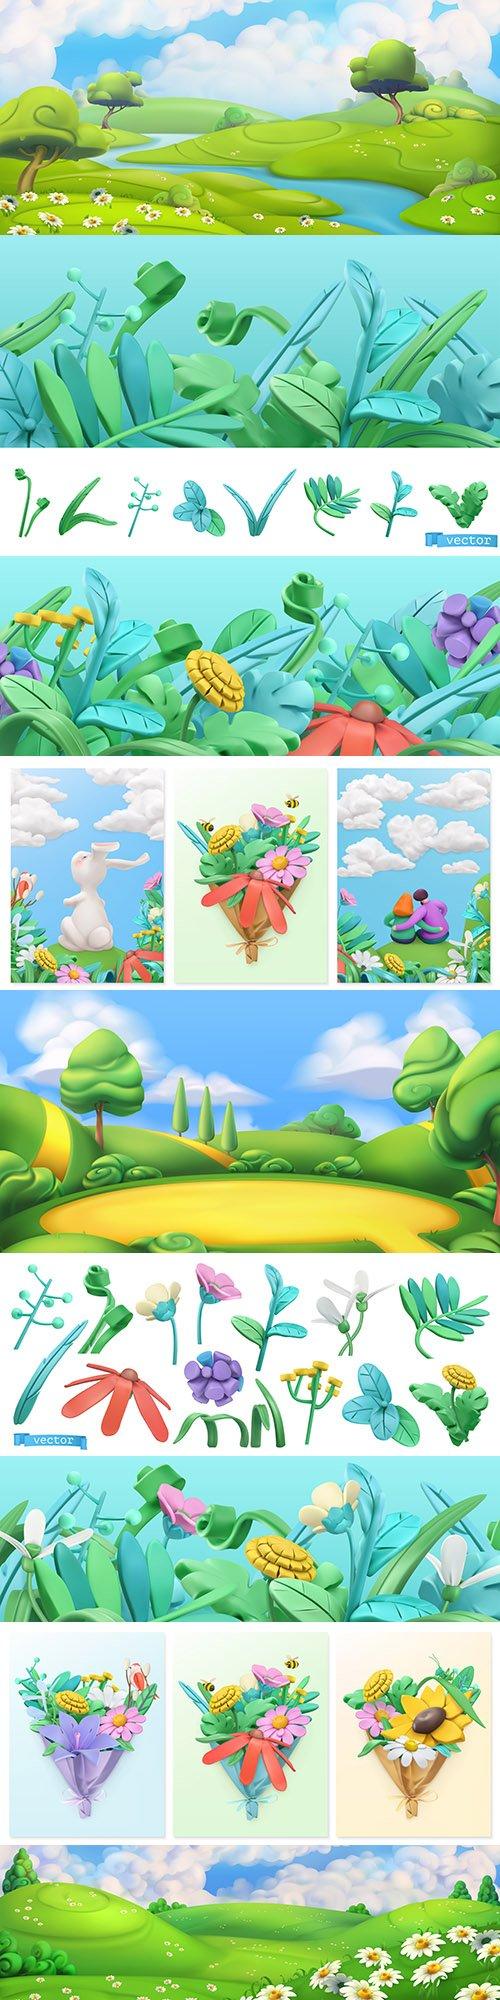 Landscape and spring flowers 3d illustrations